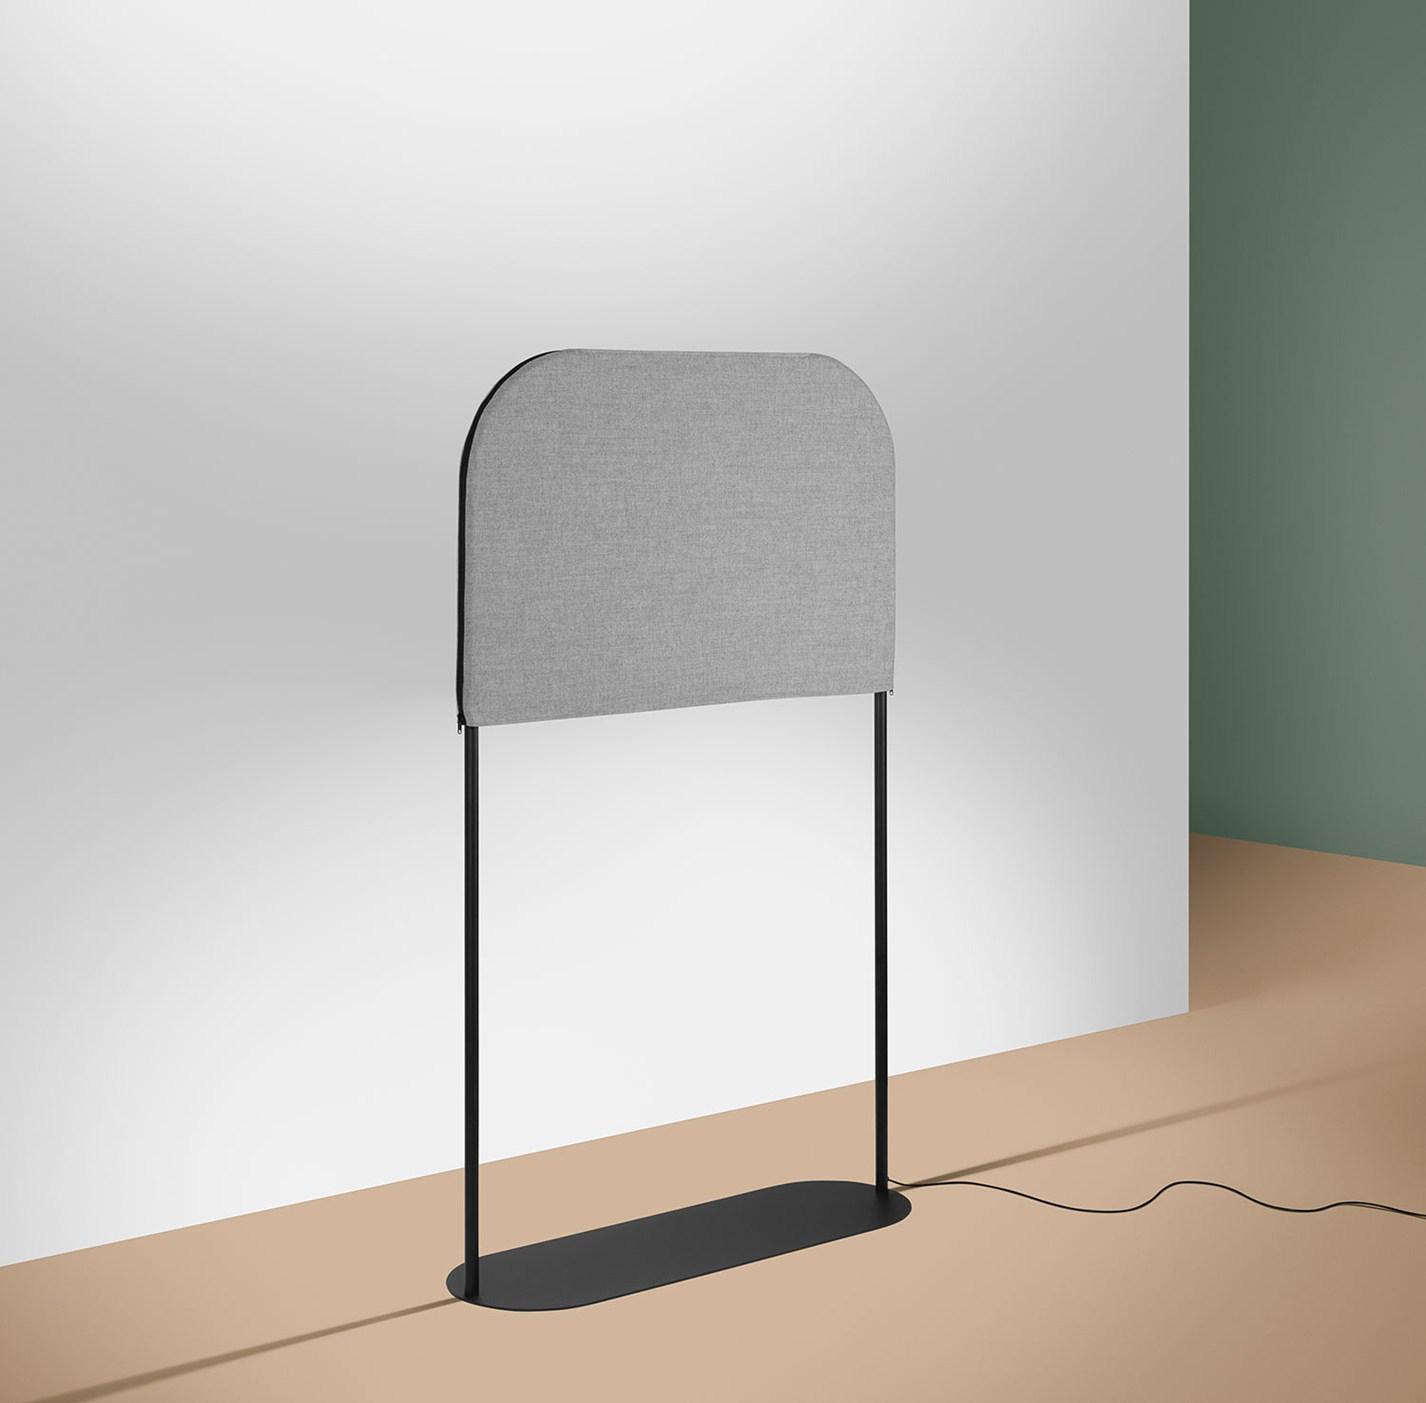 Zero Block by Johanna Jacobson Backman at Stockholm Furniture Fair 2017 | Yellowtrace